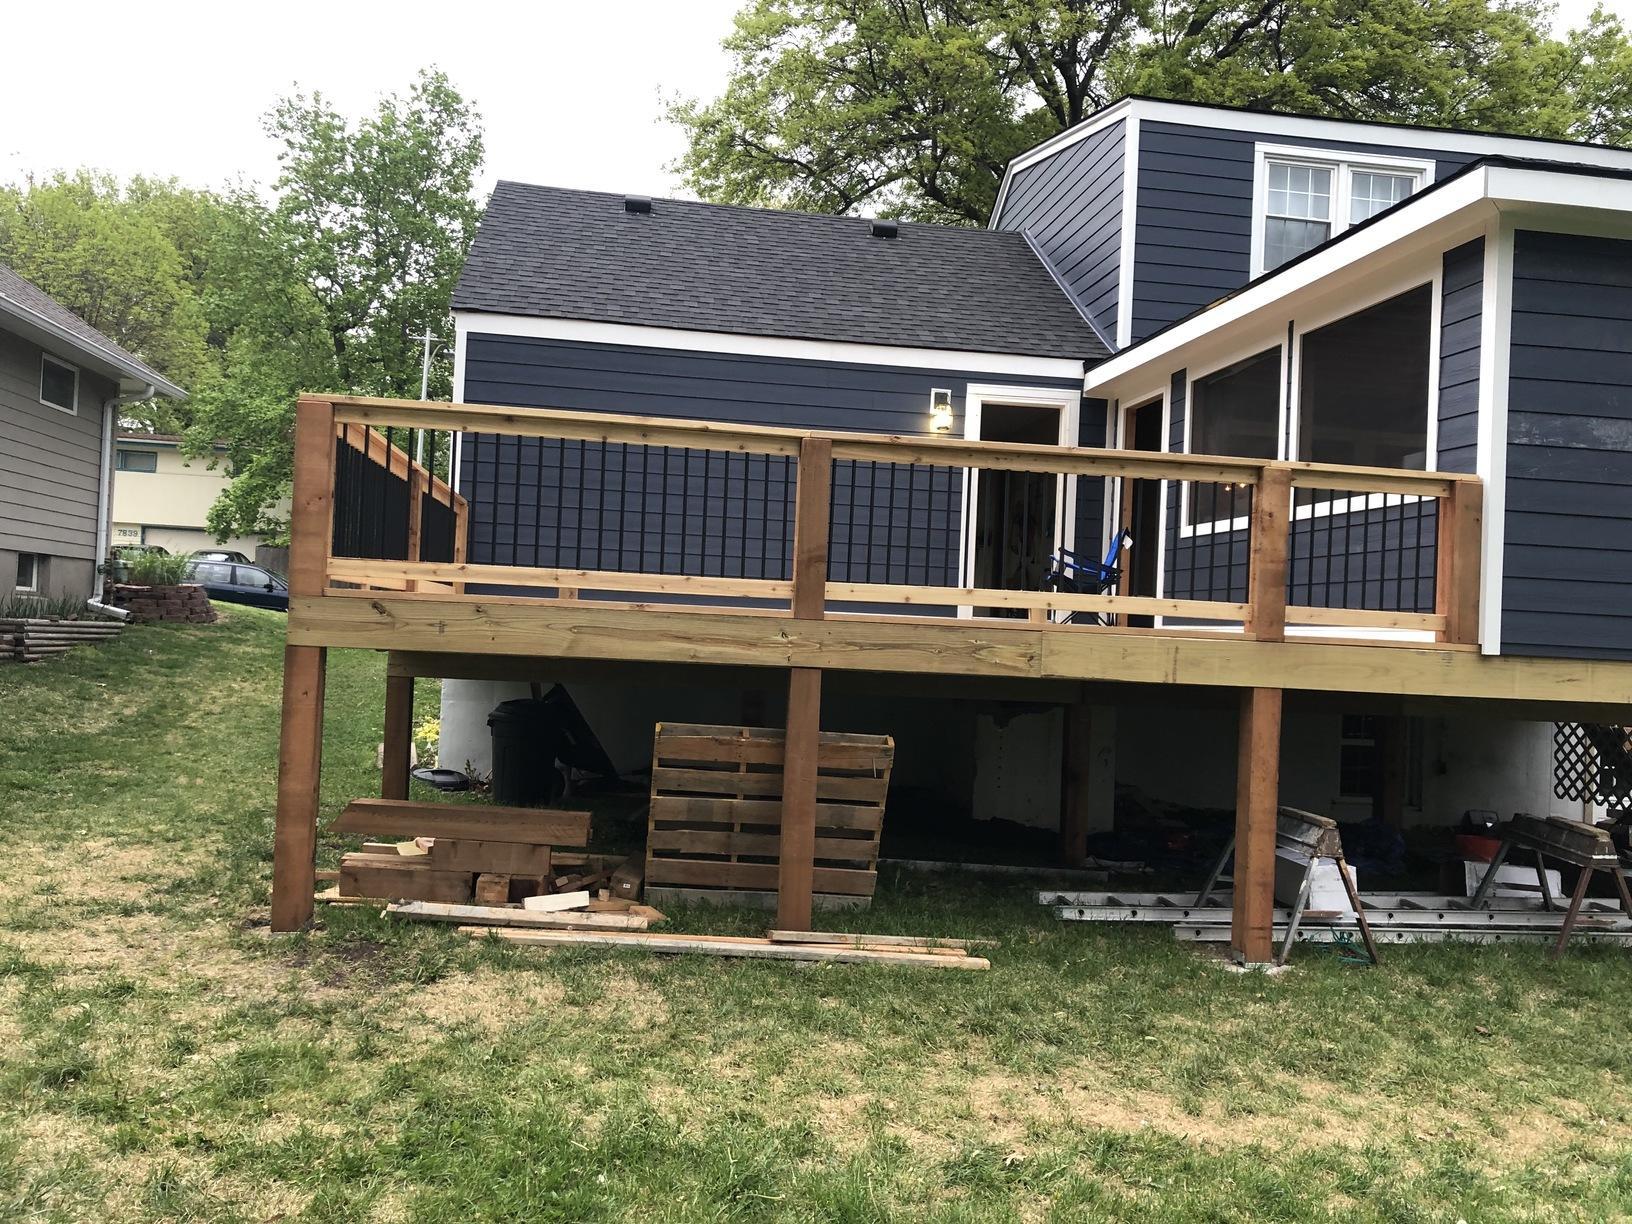 Install James Hardie Siding. Overland Park, KS - After Photo